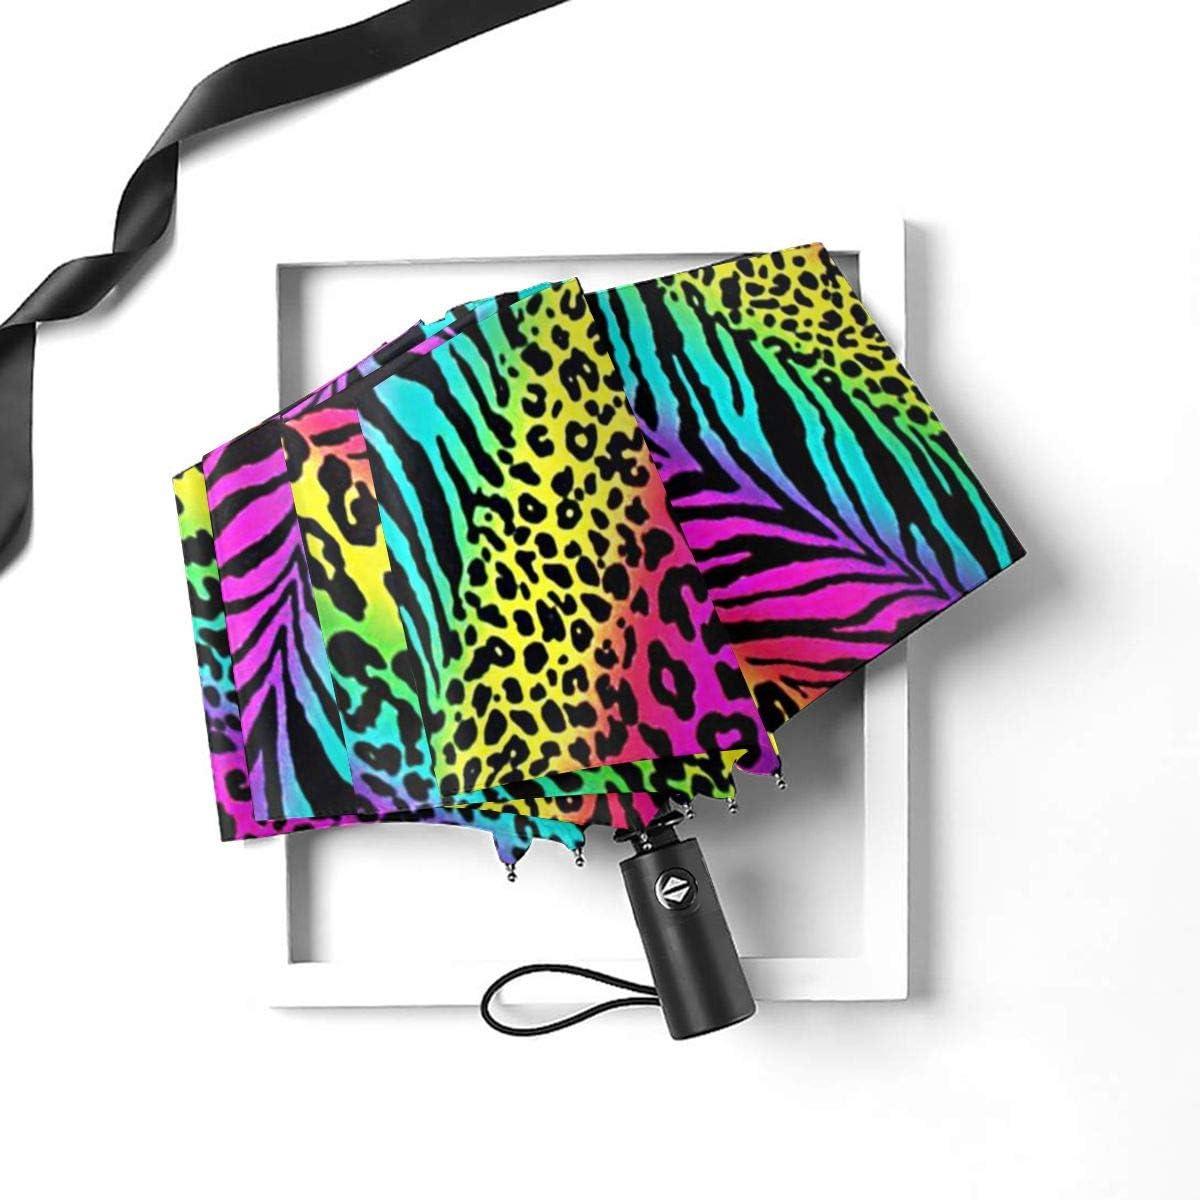 Striped Neon Rainbow Zebra Automatic Open Folding Compact Travel Umbrellas For Women